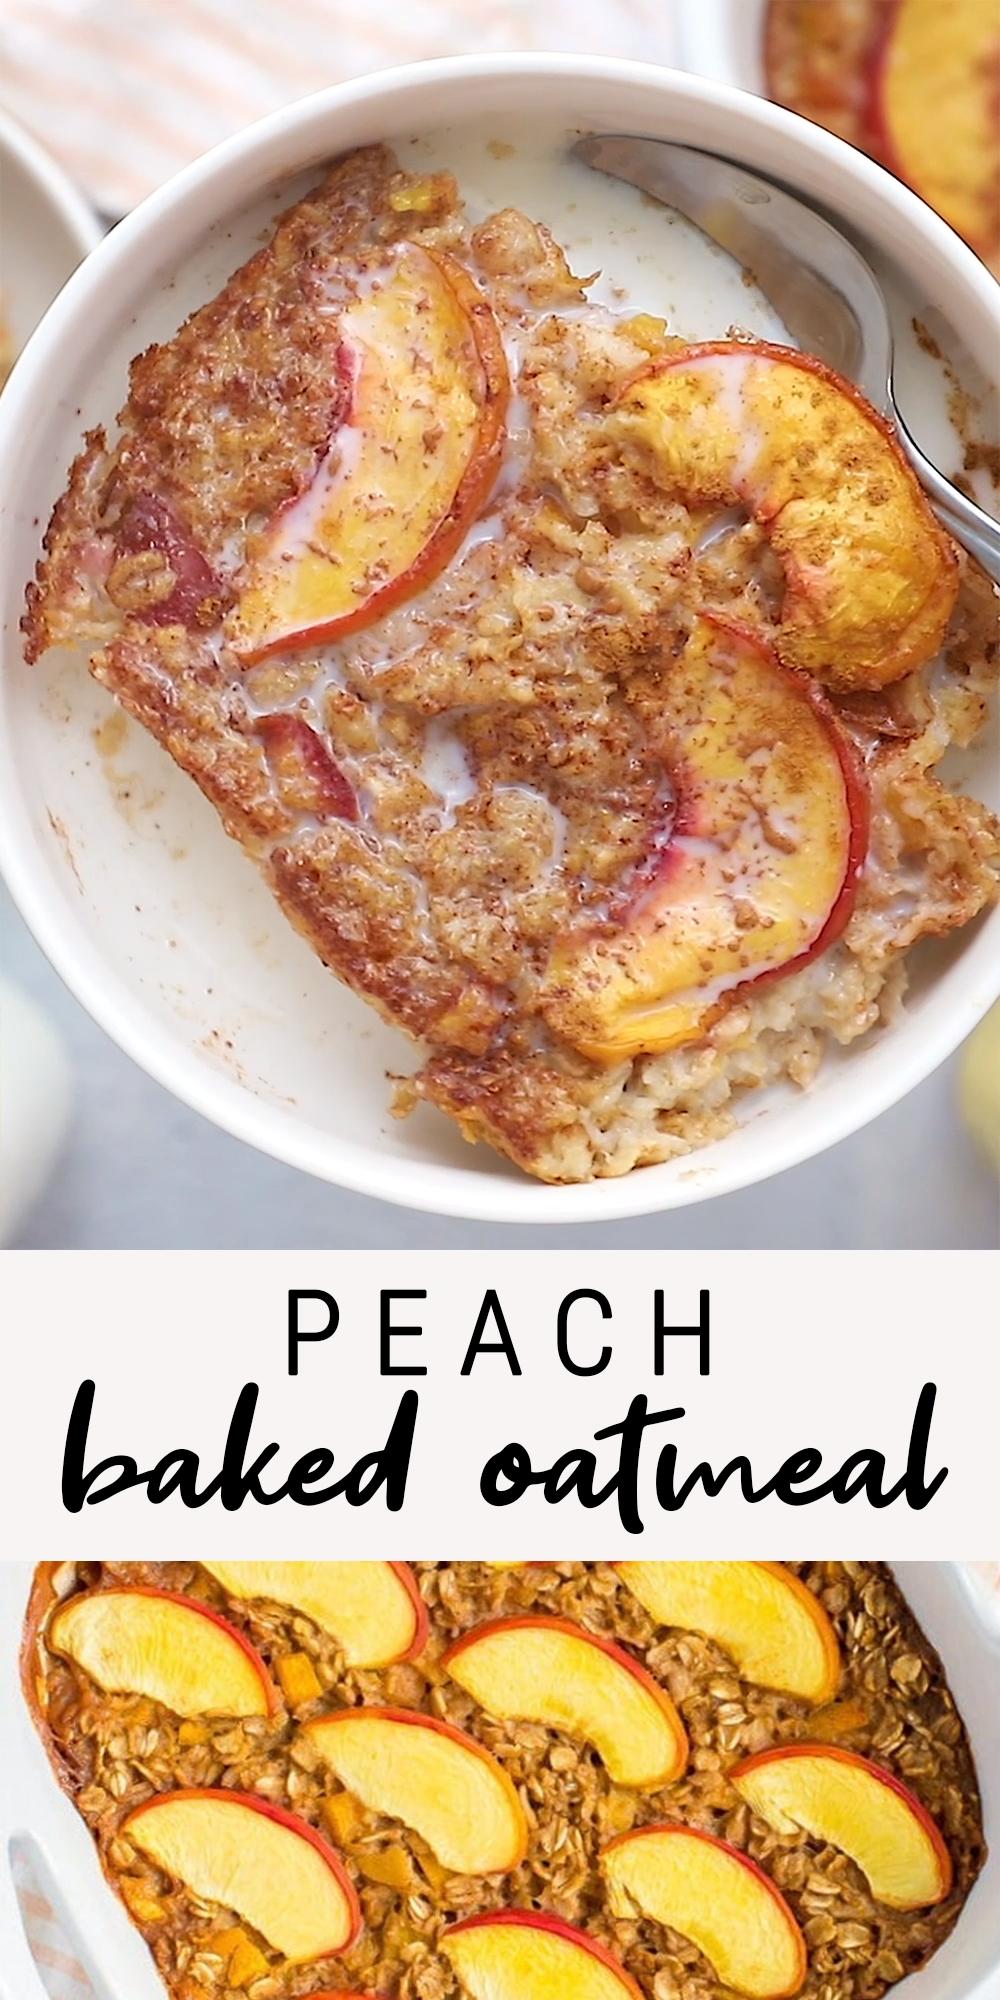 Photo of Healthy Peach Baked Oatmeal